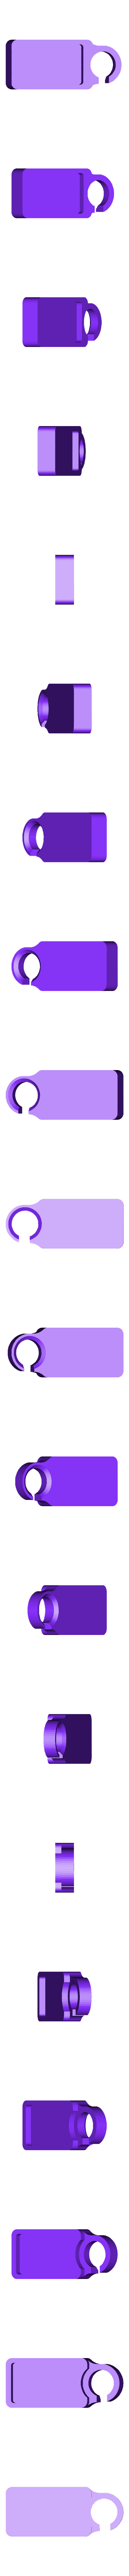 Empty key tag.stl Download free STL file Key tags, needing no key ring • Model to 3D print, Lykle